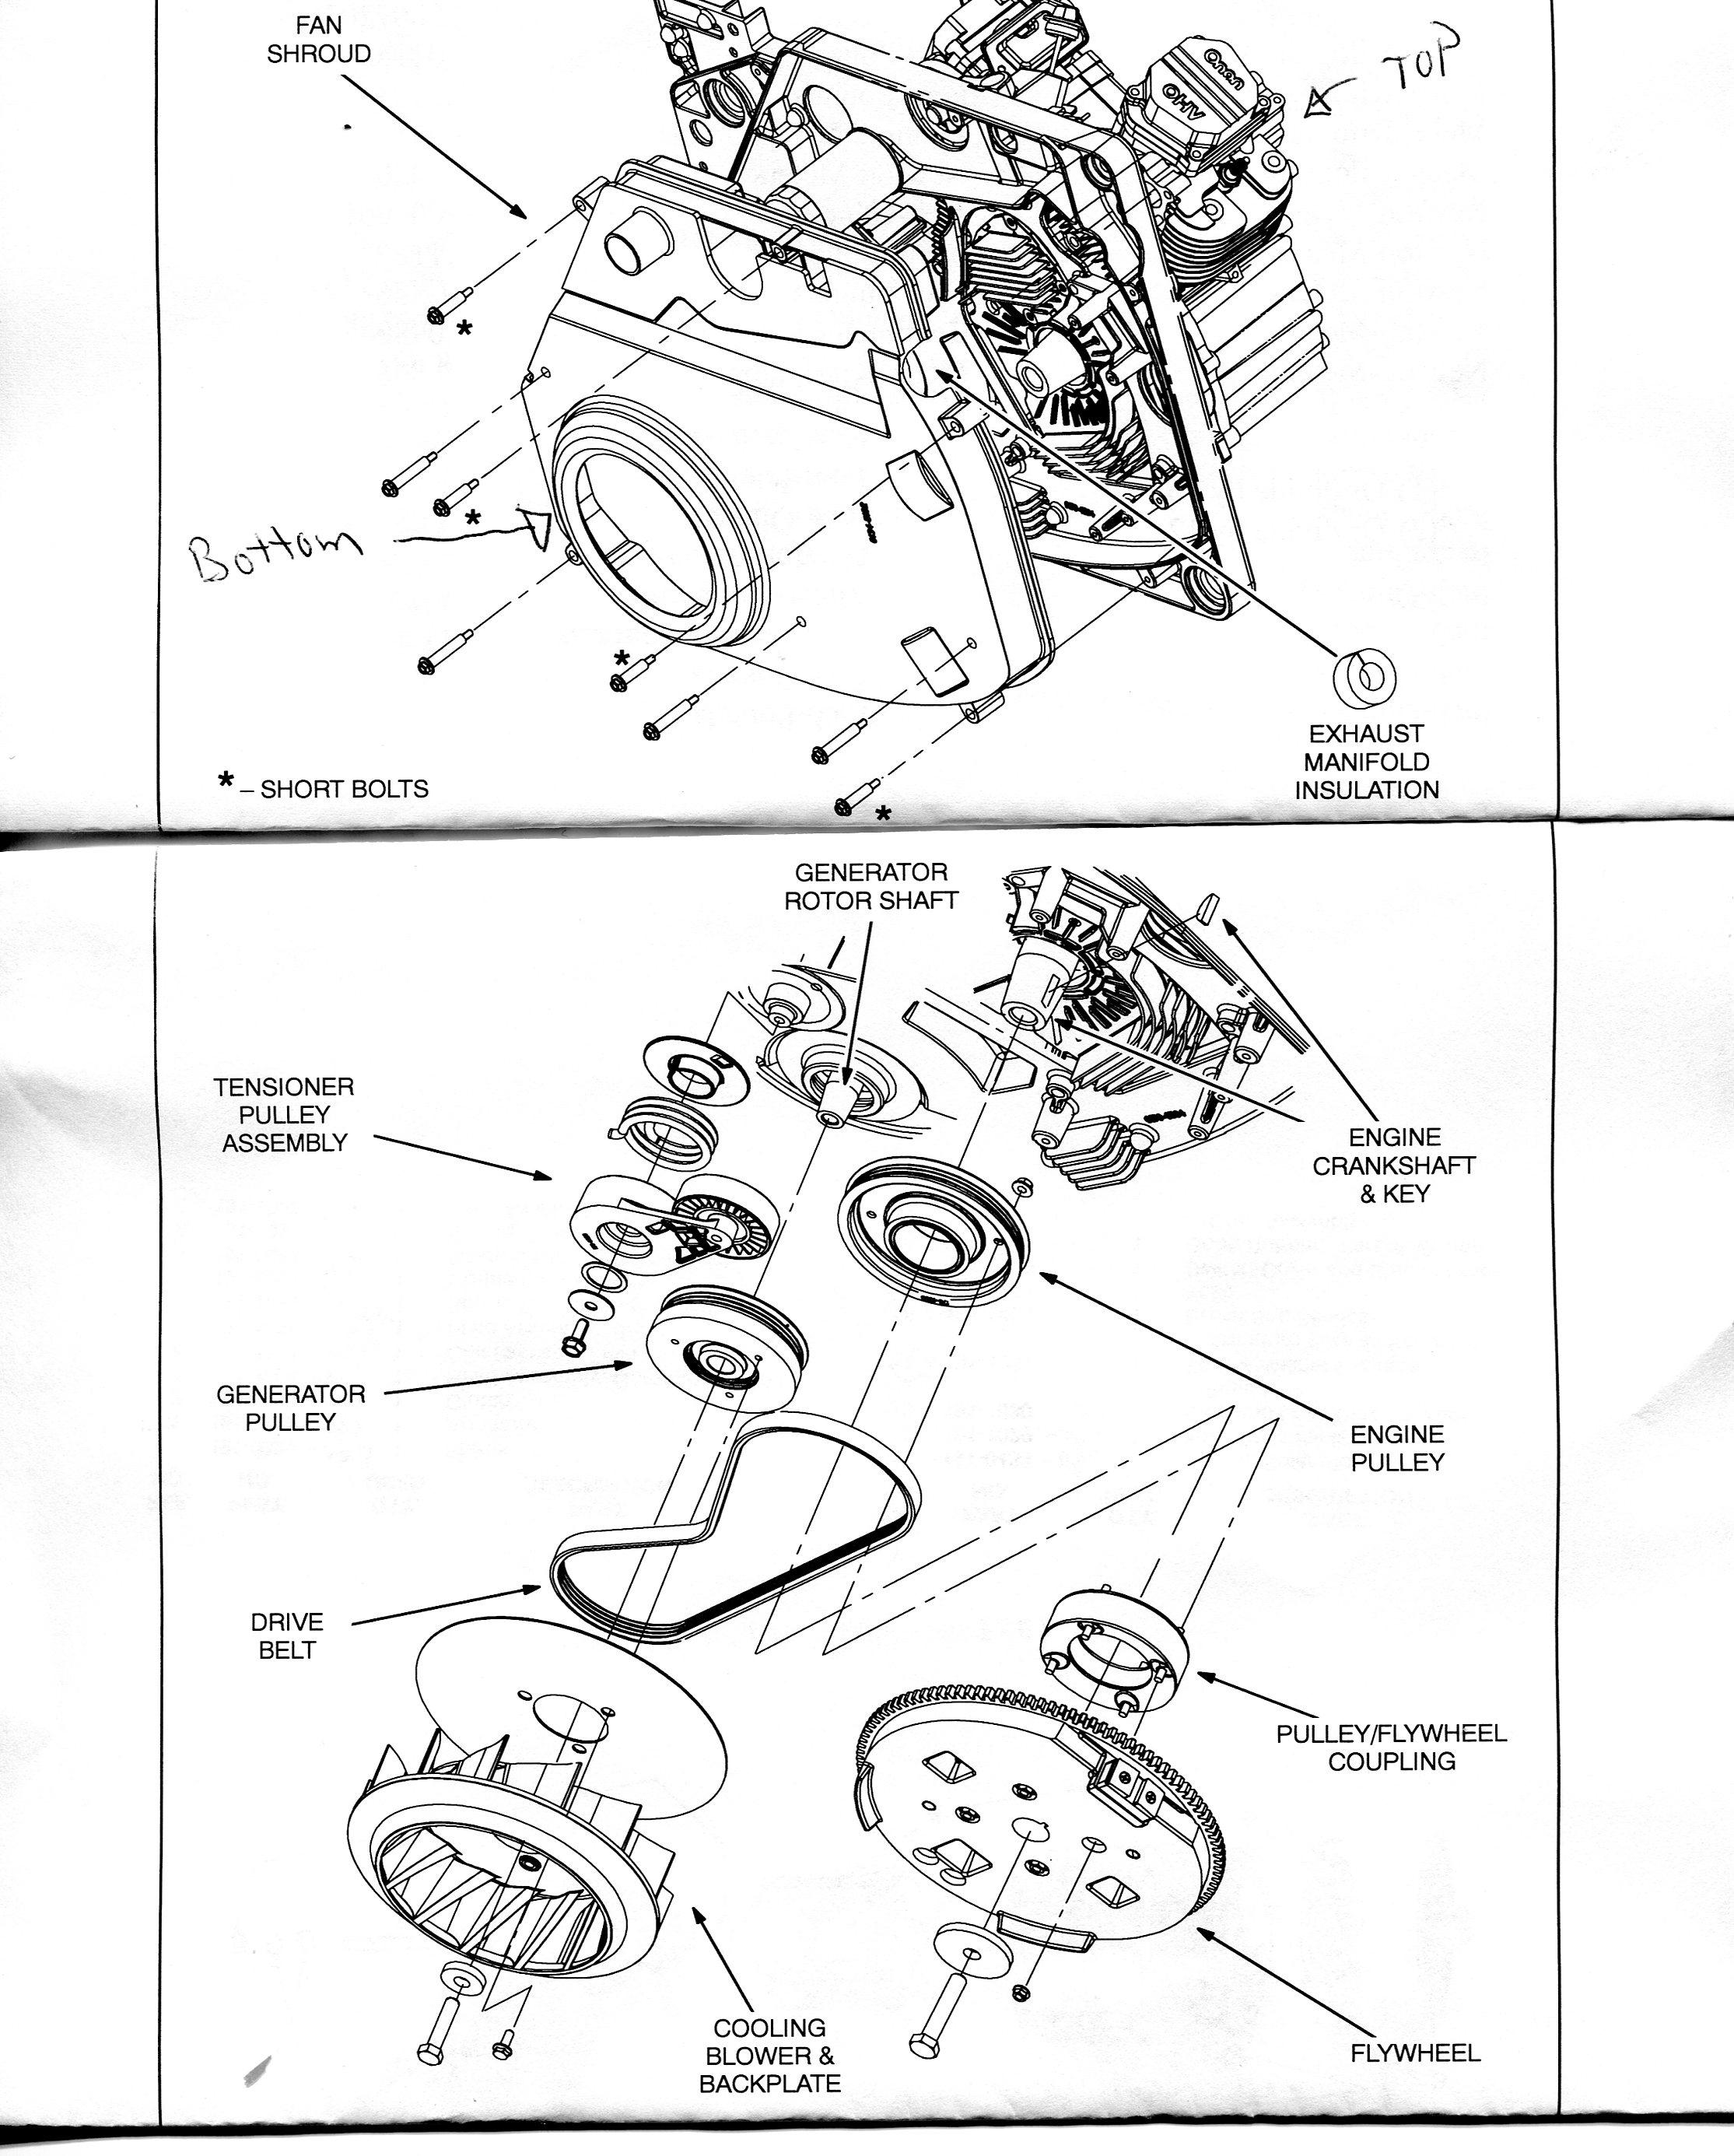 6100 Generator Wiring Schematic - Trusted Wiring Diagram •